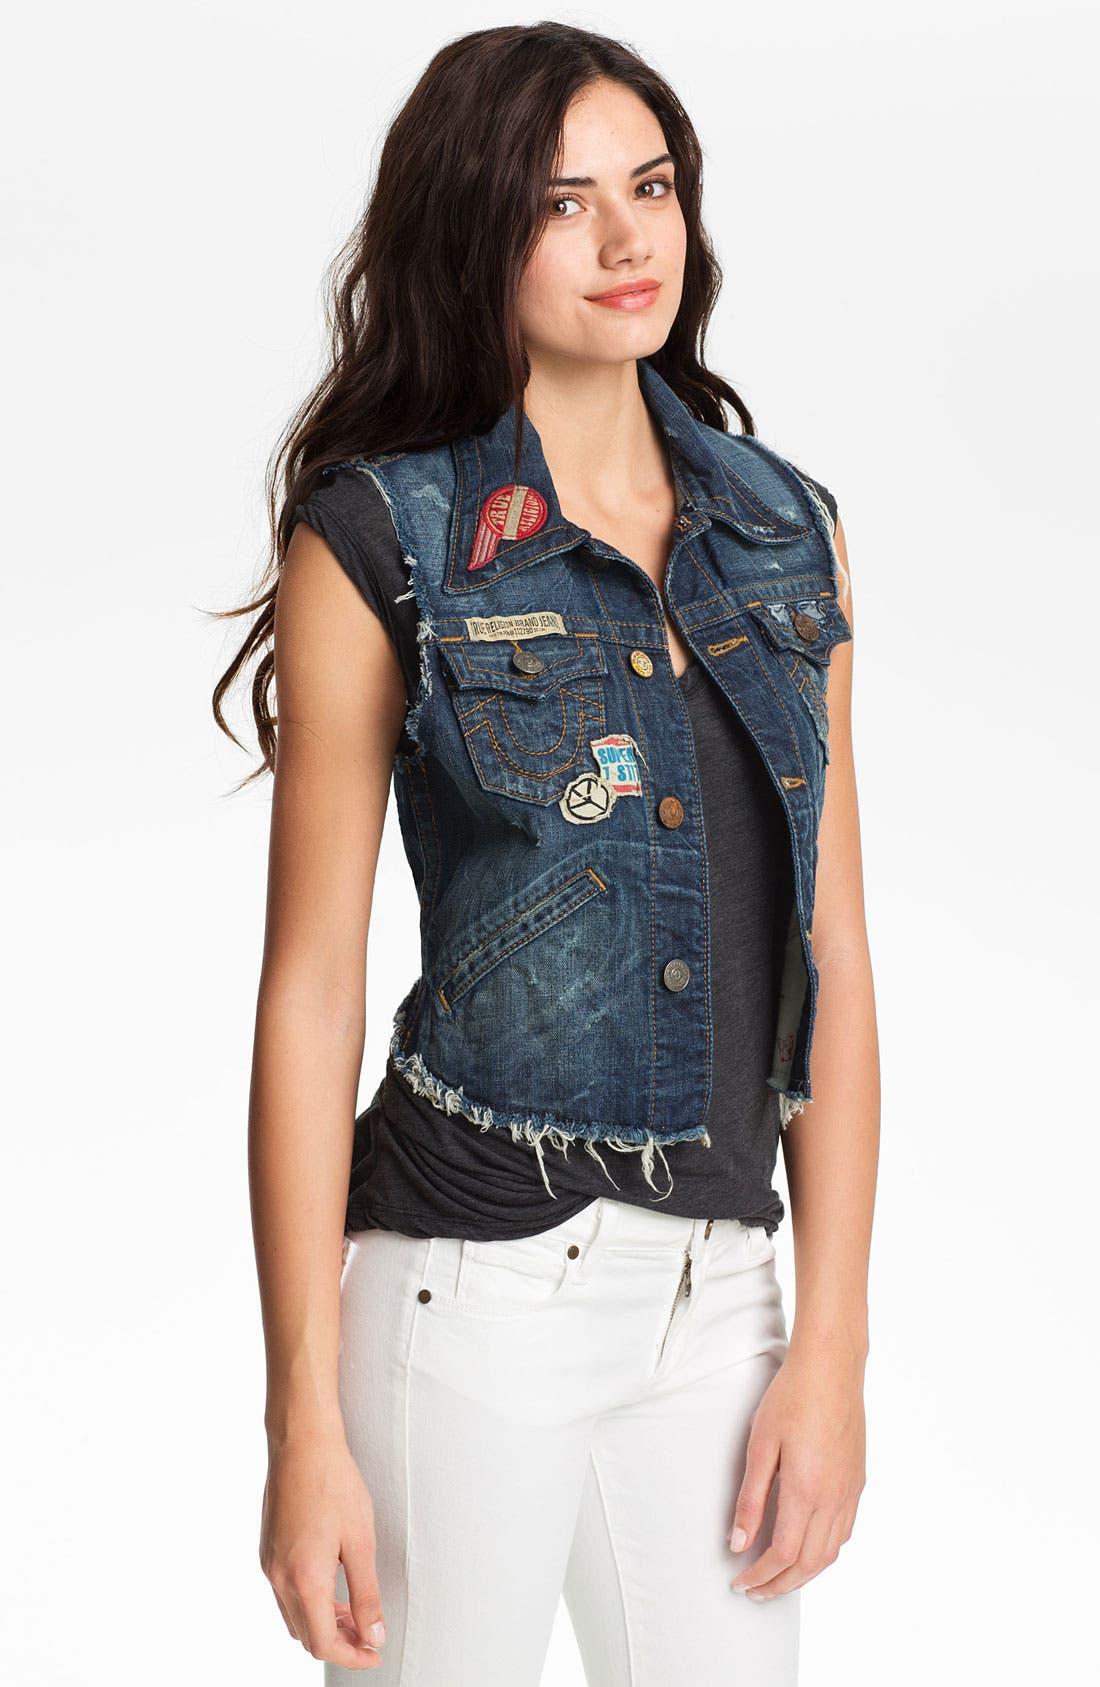 Main Image - True Religion Brand Jeans 'Jada' Cutoff Denim Vest